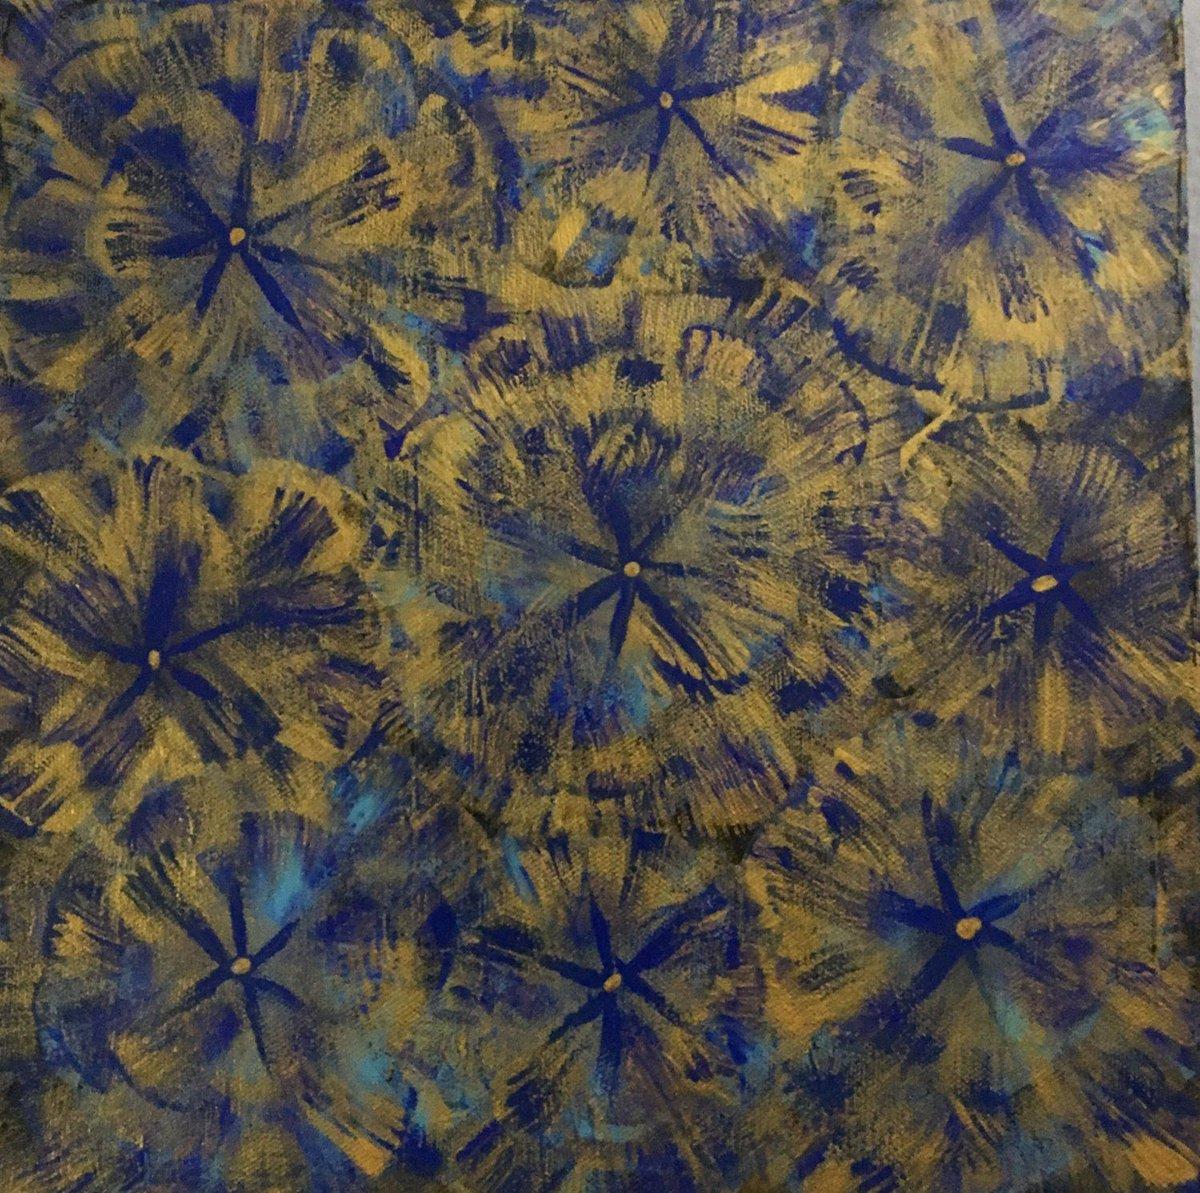 Tracy Fetter On Twitter Herbert Epoxy Resin Abstract Flower